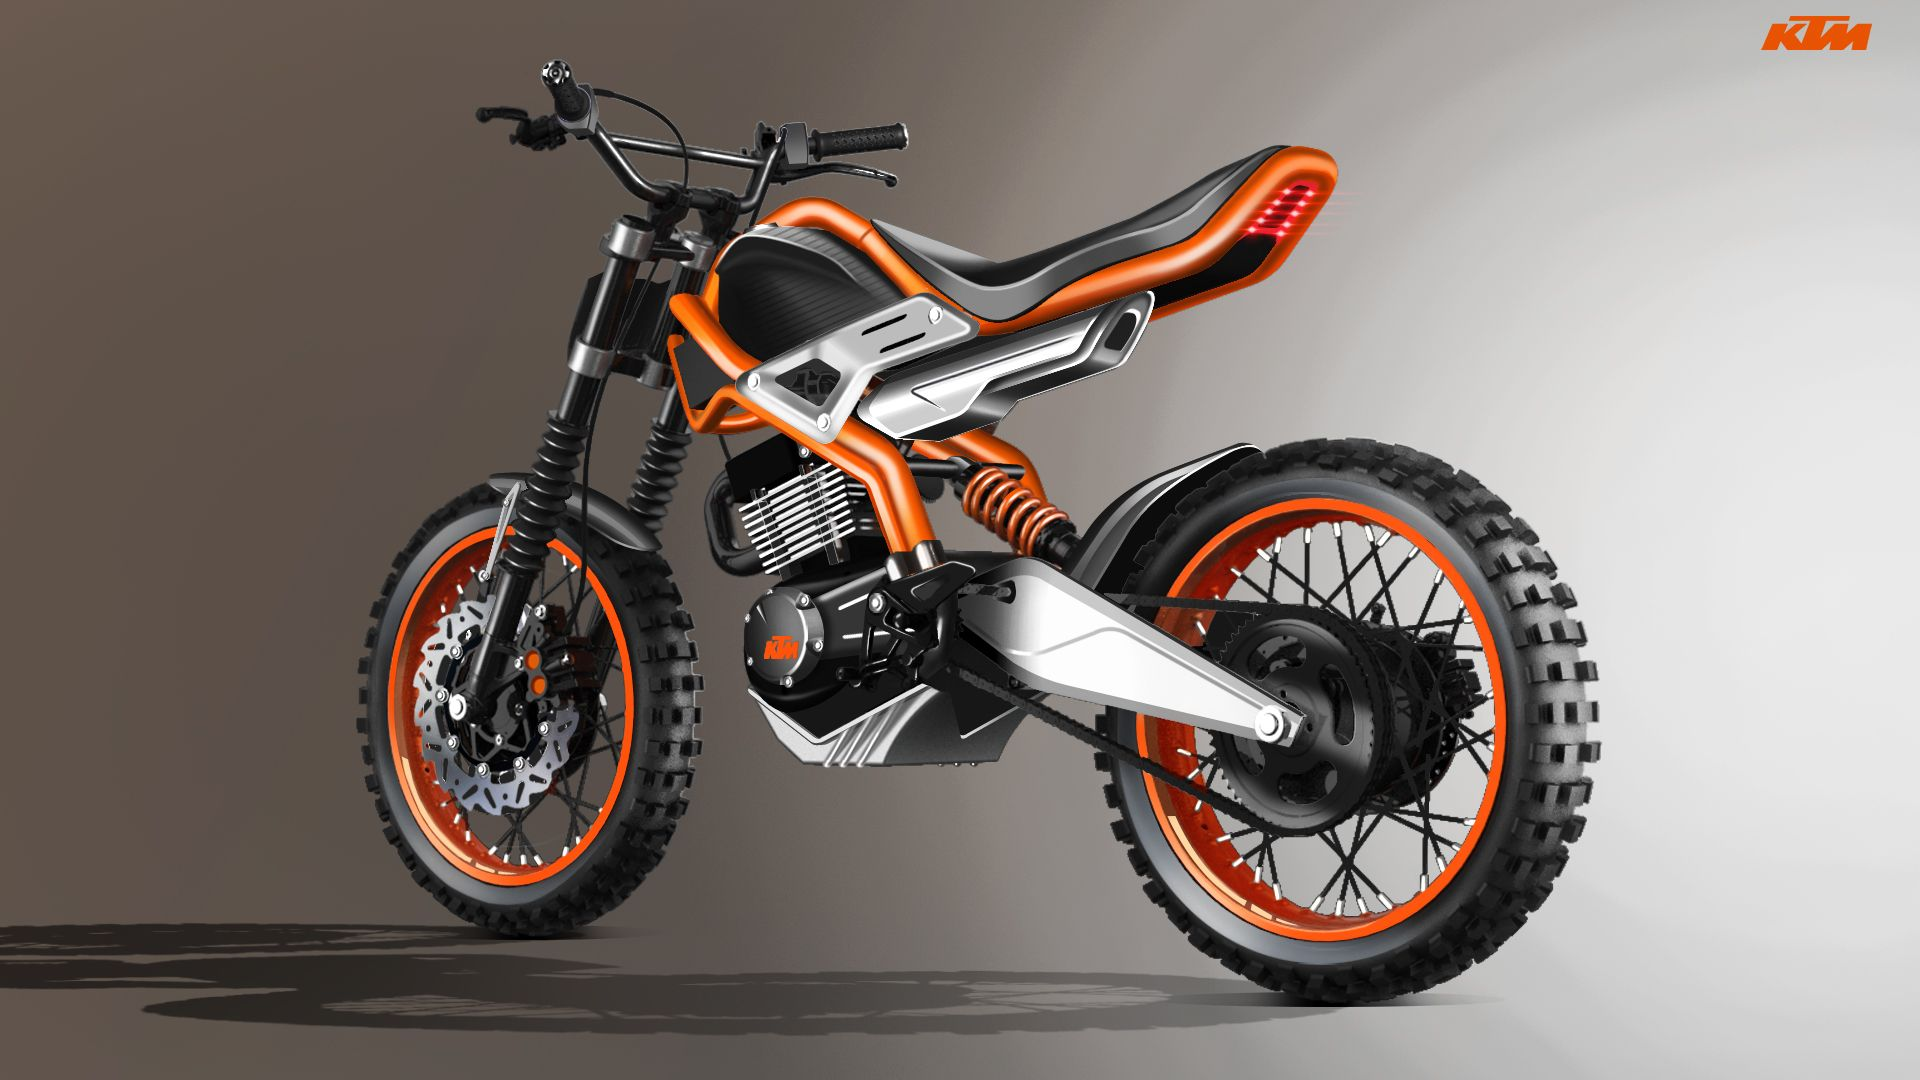 Ktm 135 Scrambler A Low Cost Motorcycle For India On Behance Sepeda Kendaraan Motor Jalanan